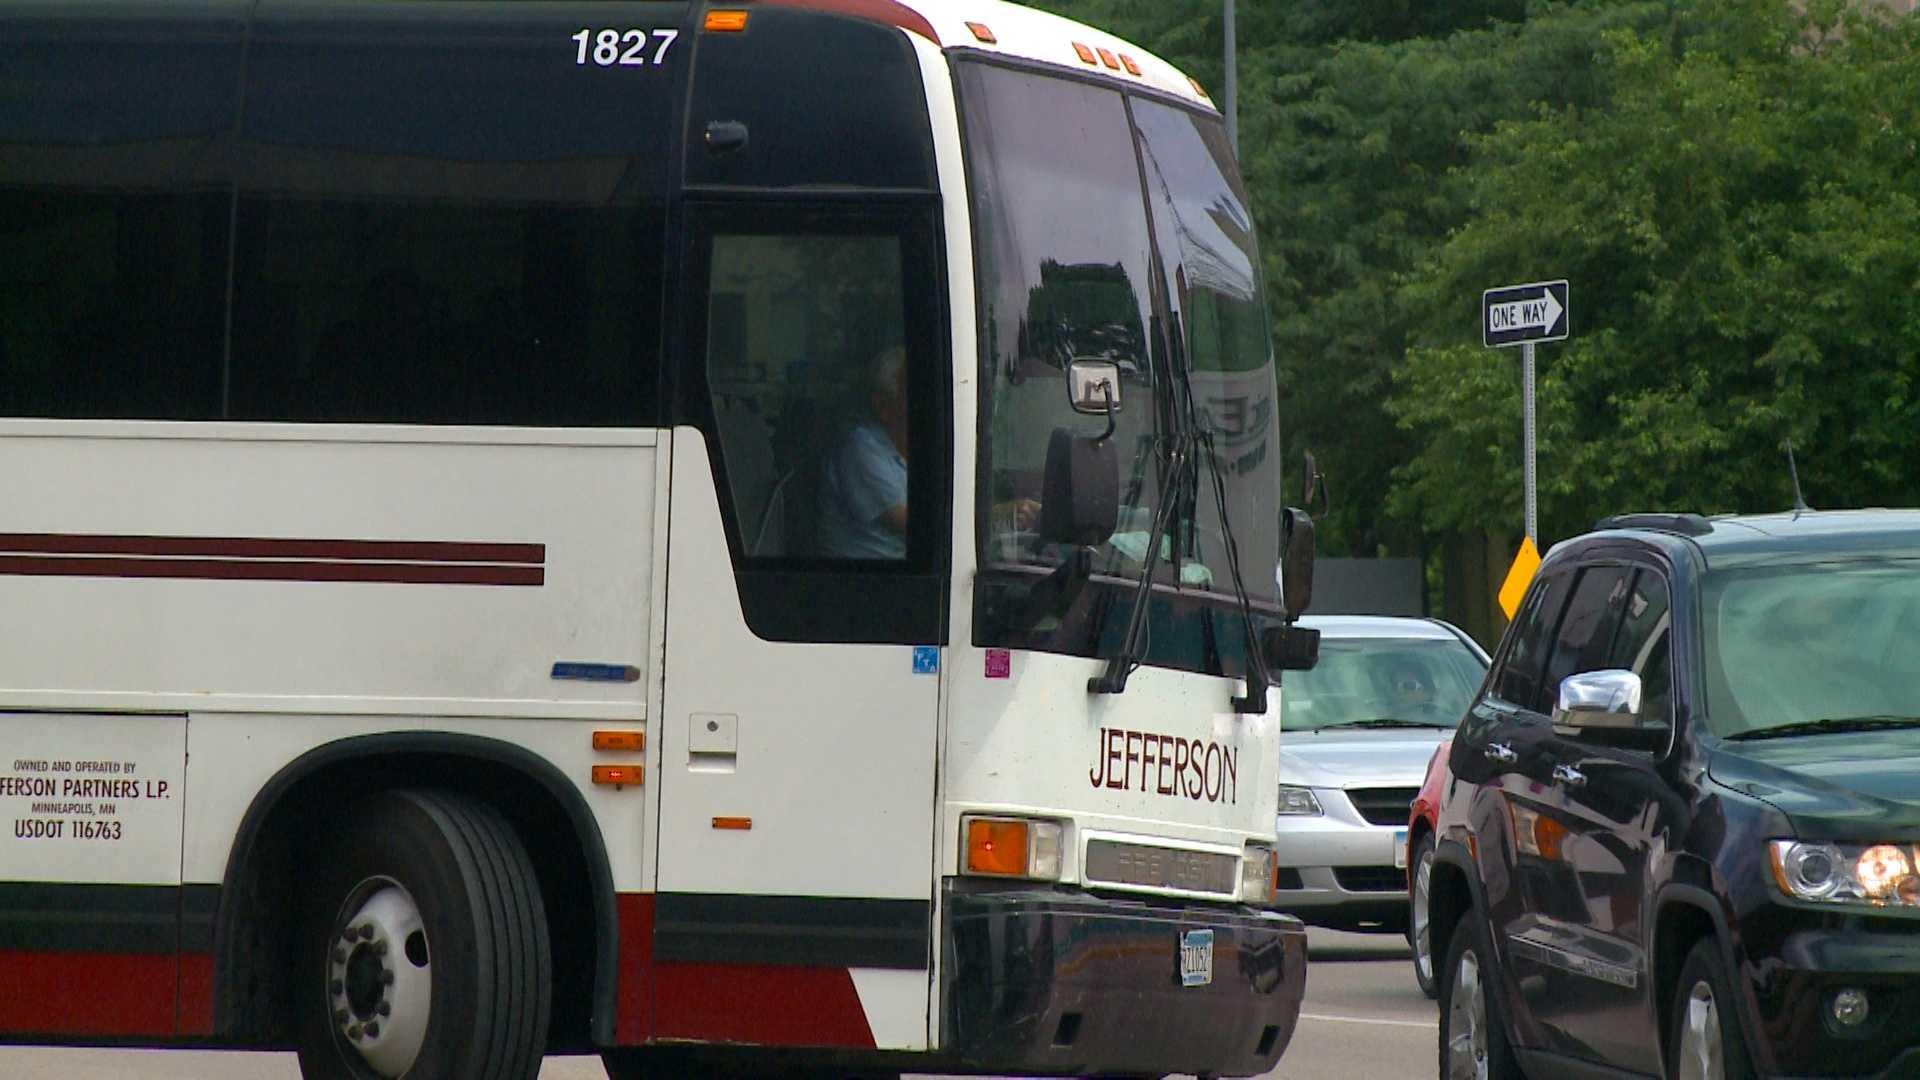 Jefferson line bus